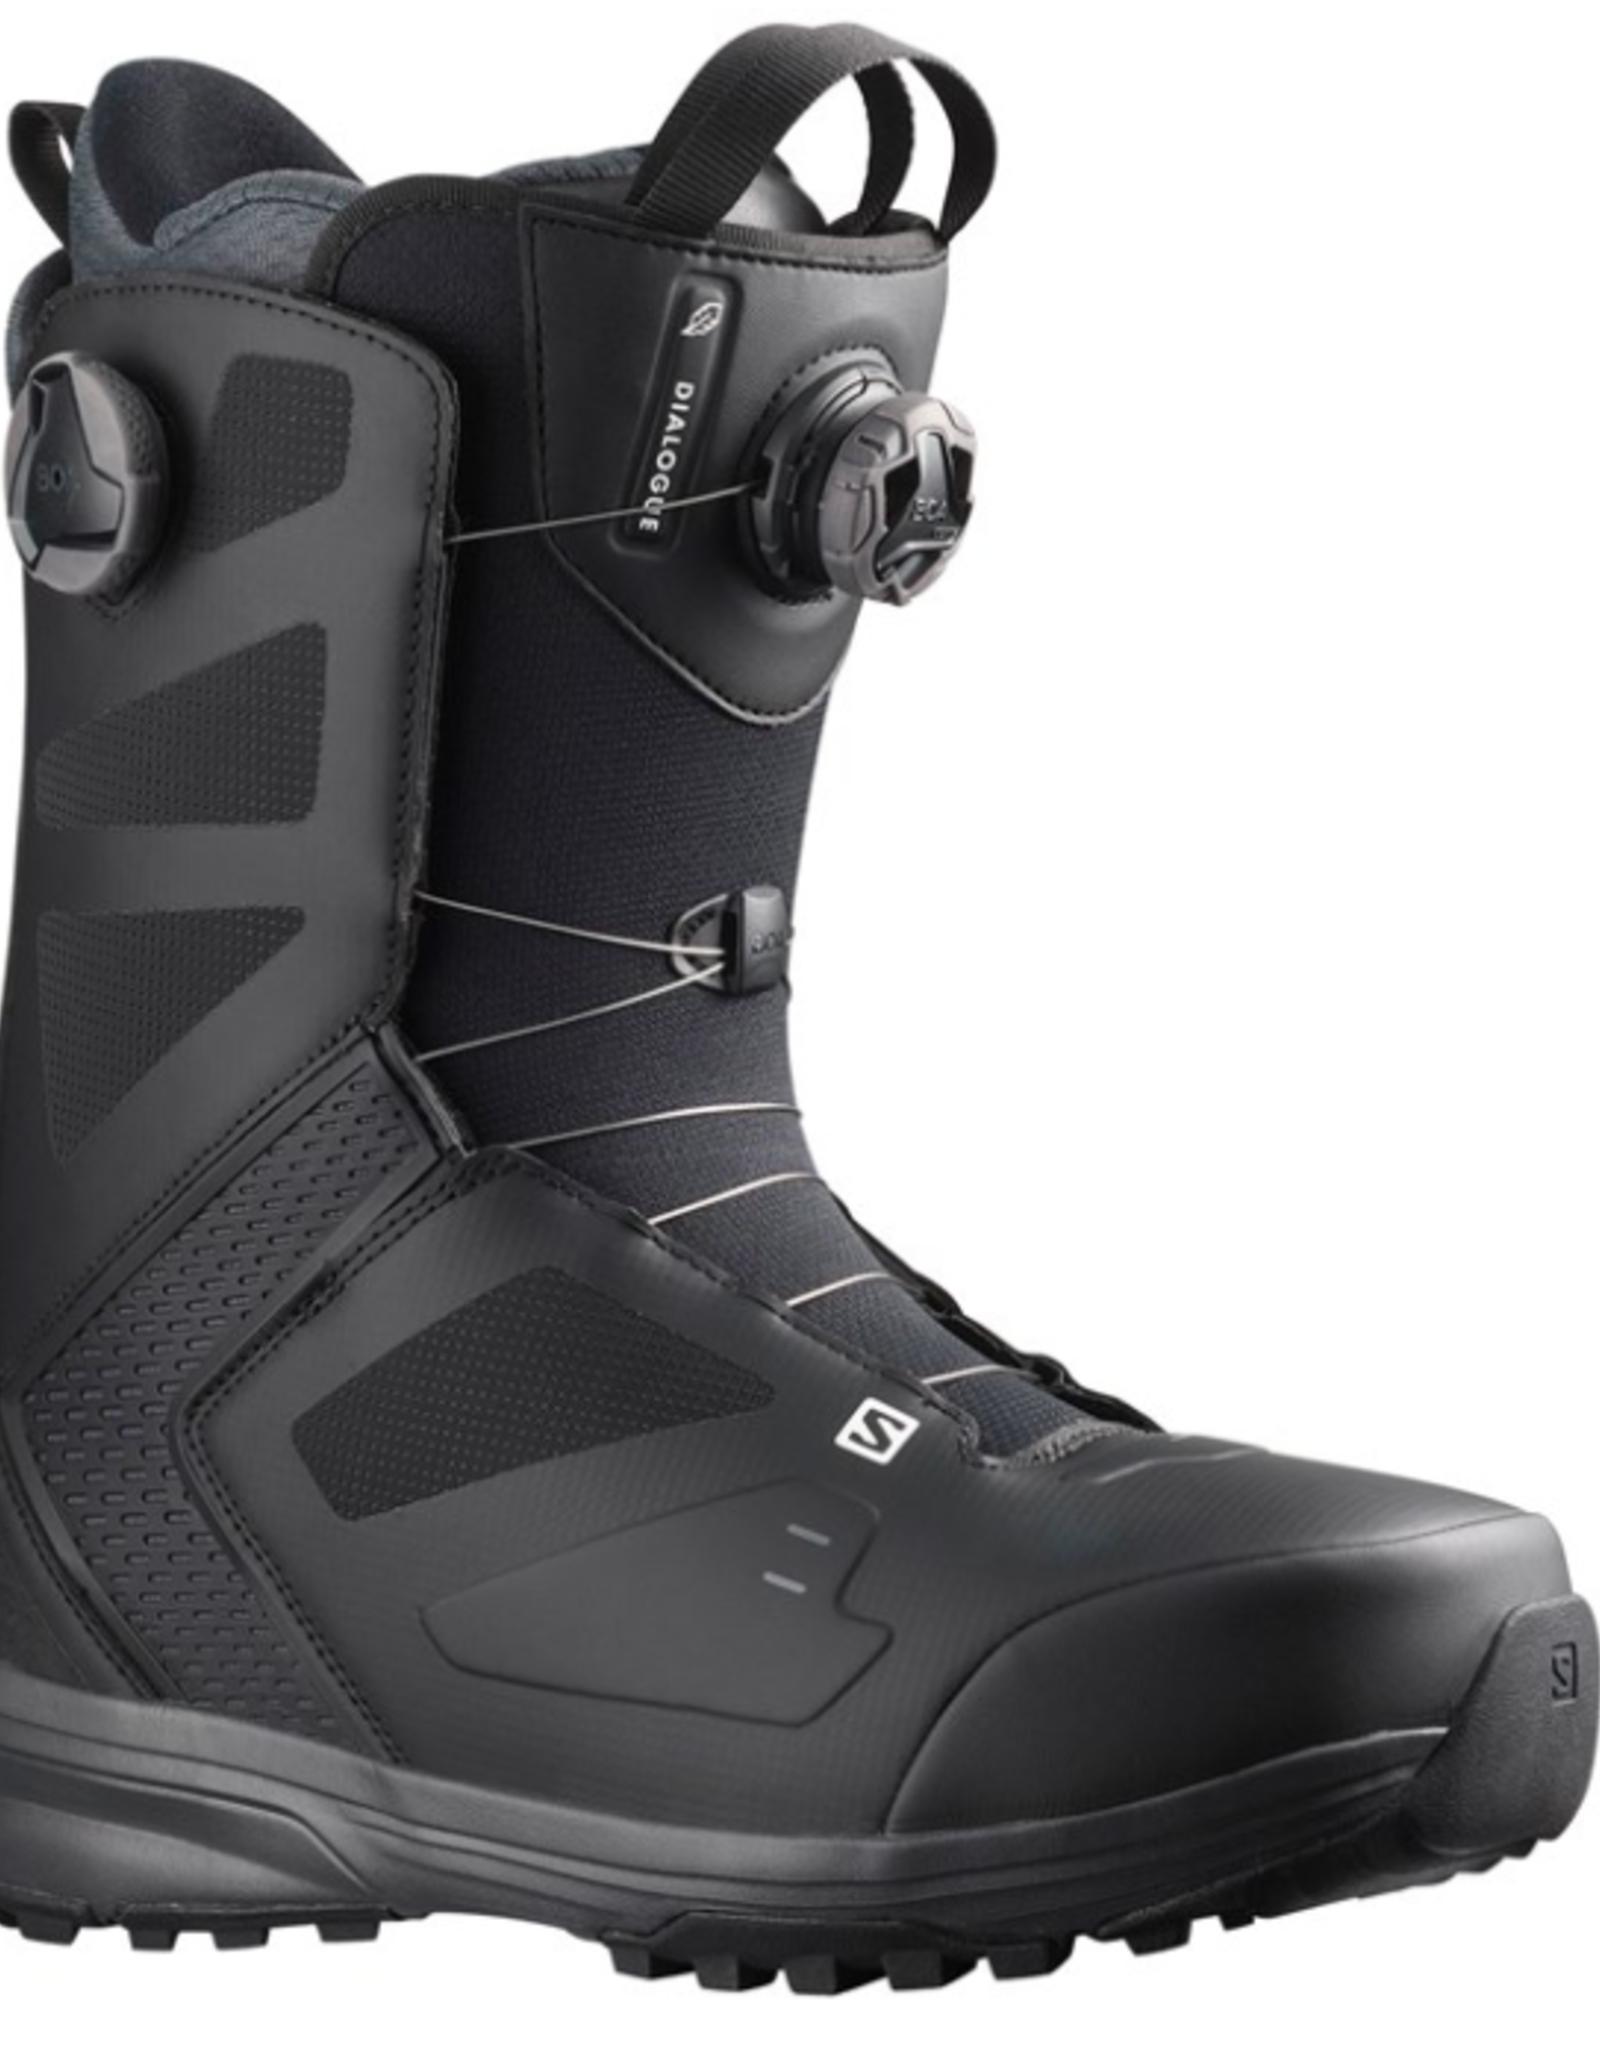 Salomon Men's Dialogue Dual Boa Wide Snowboard Boots Black 2022